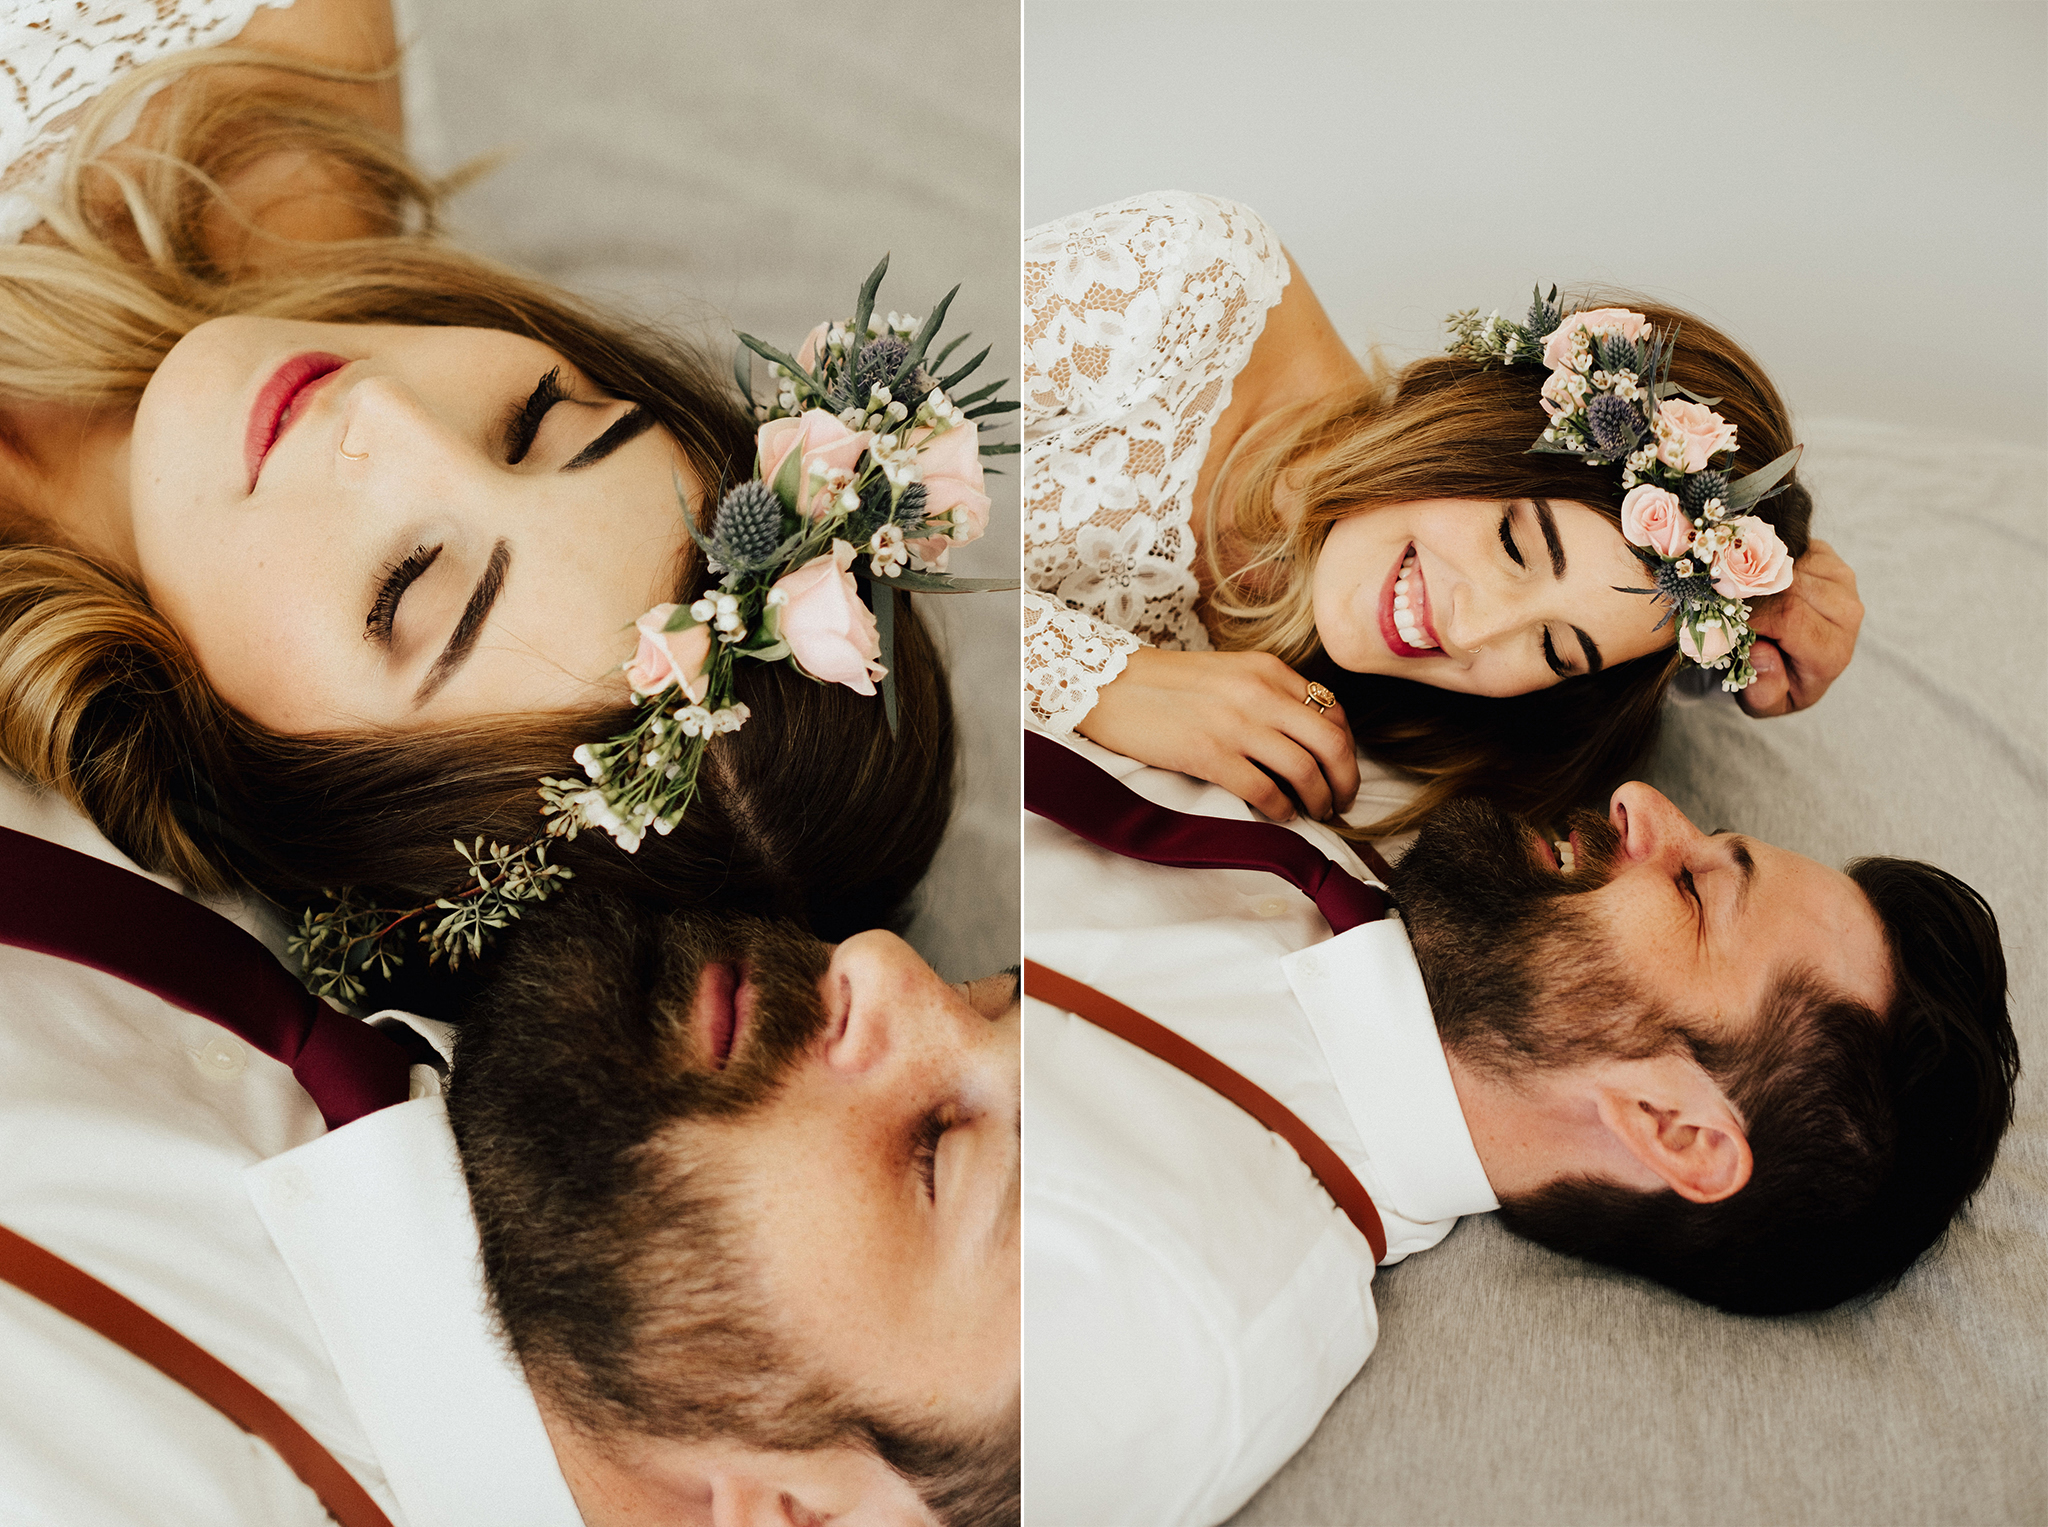 Arizona-Adventure-Elopement-Wedding-Photographer-87.jpg